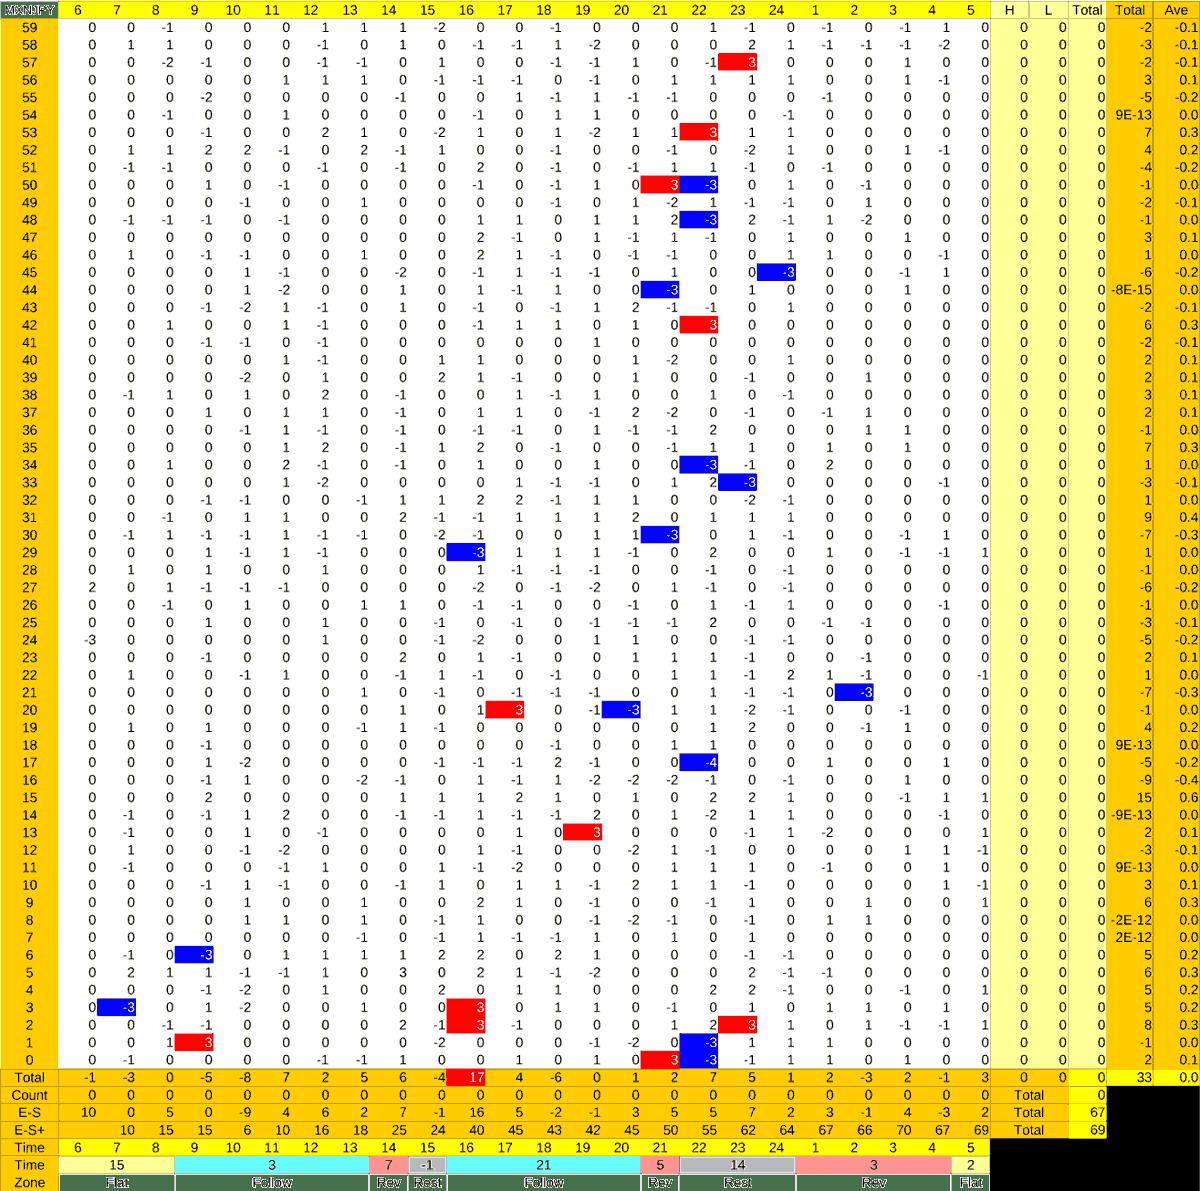 20210709_HS(3)MXNJPY